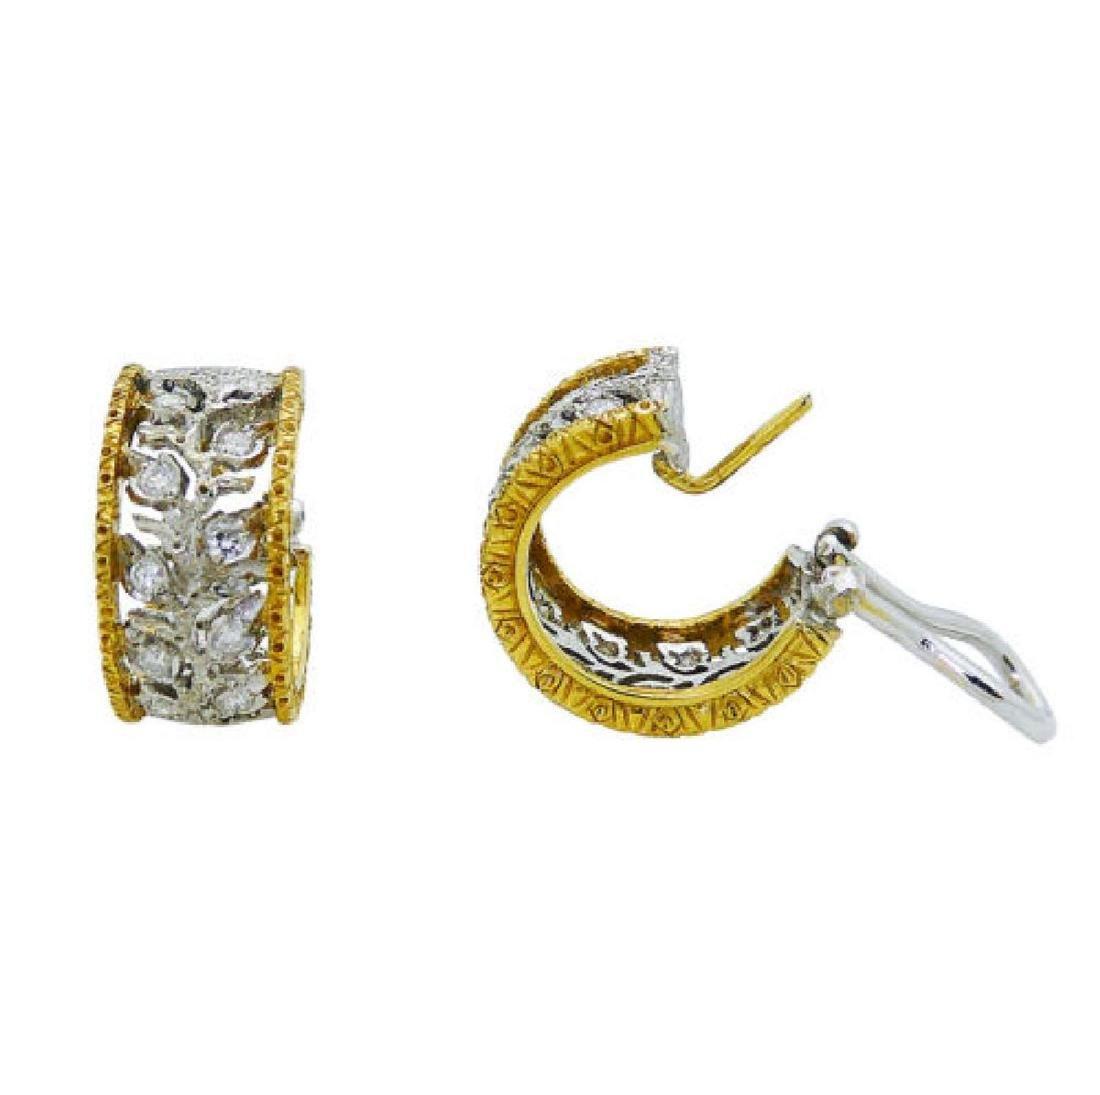 Buccellati 18k TwoTone Scacchi Diamond Hoop Earrings